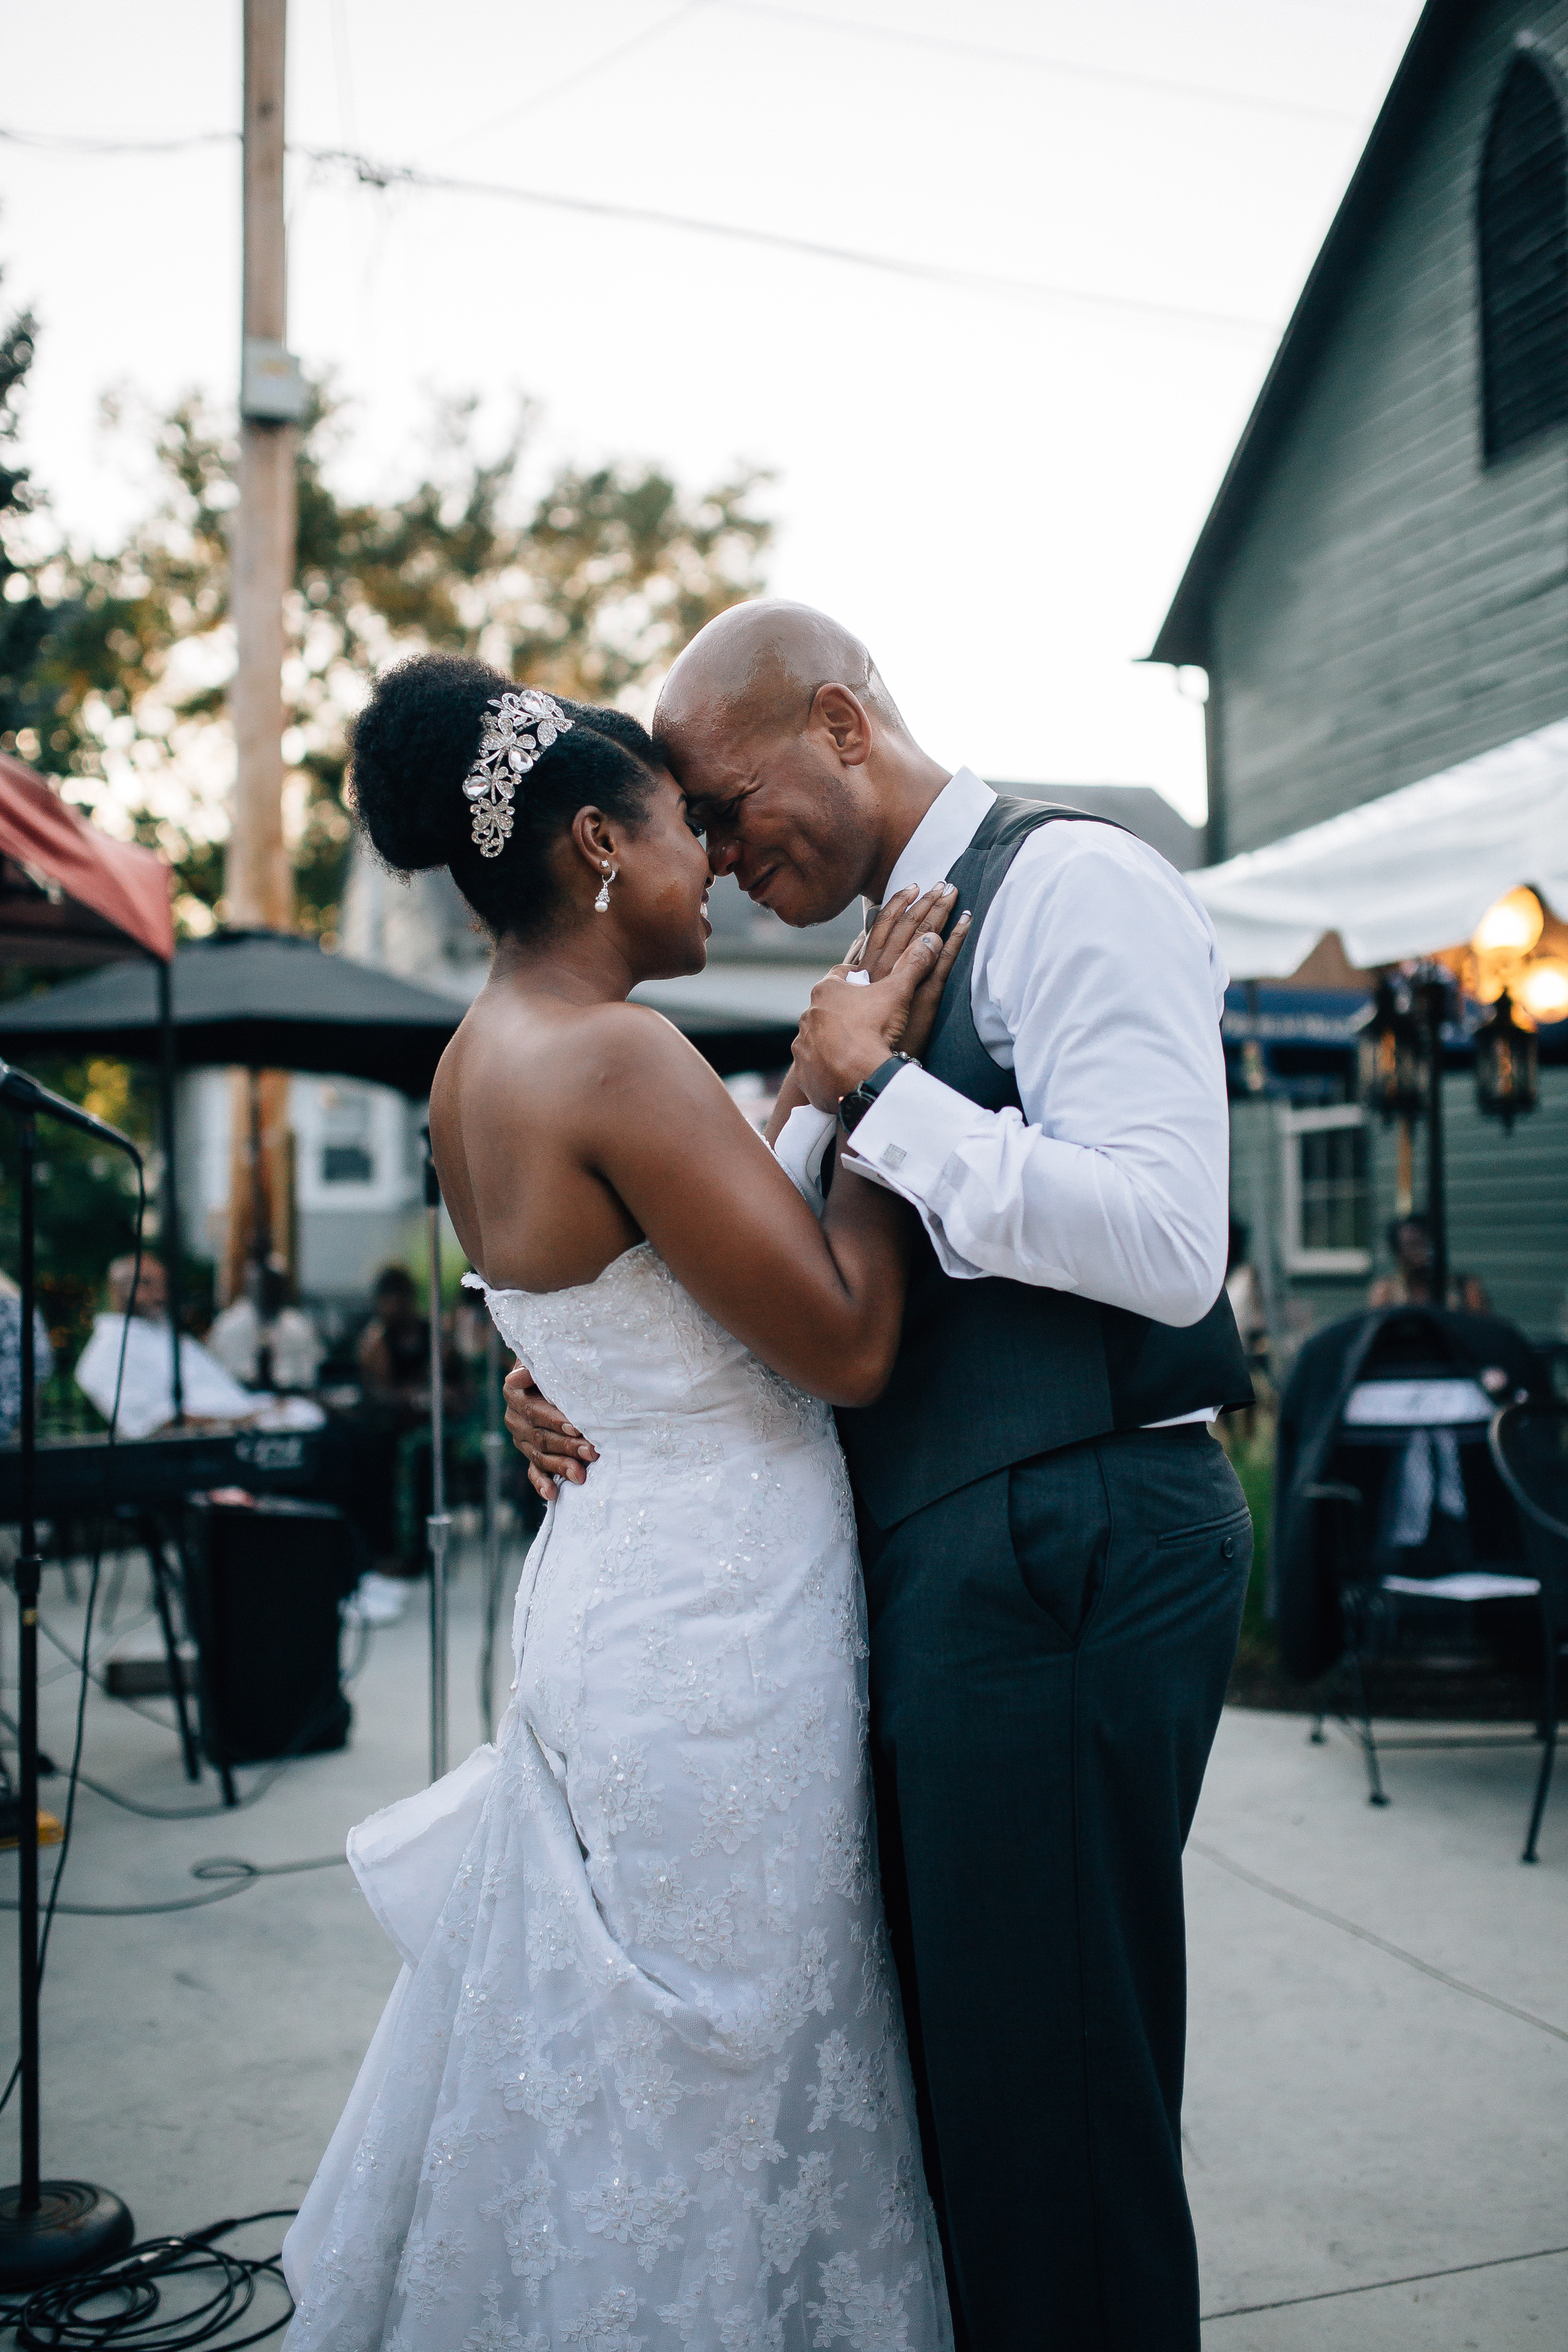 Chuck & Alicia's Wedding - Corrie Mick Photography-631.jpg